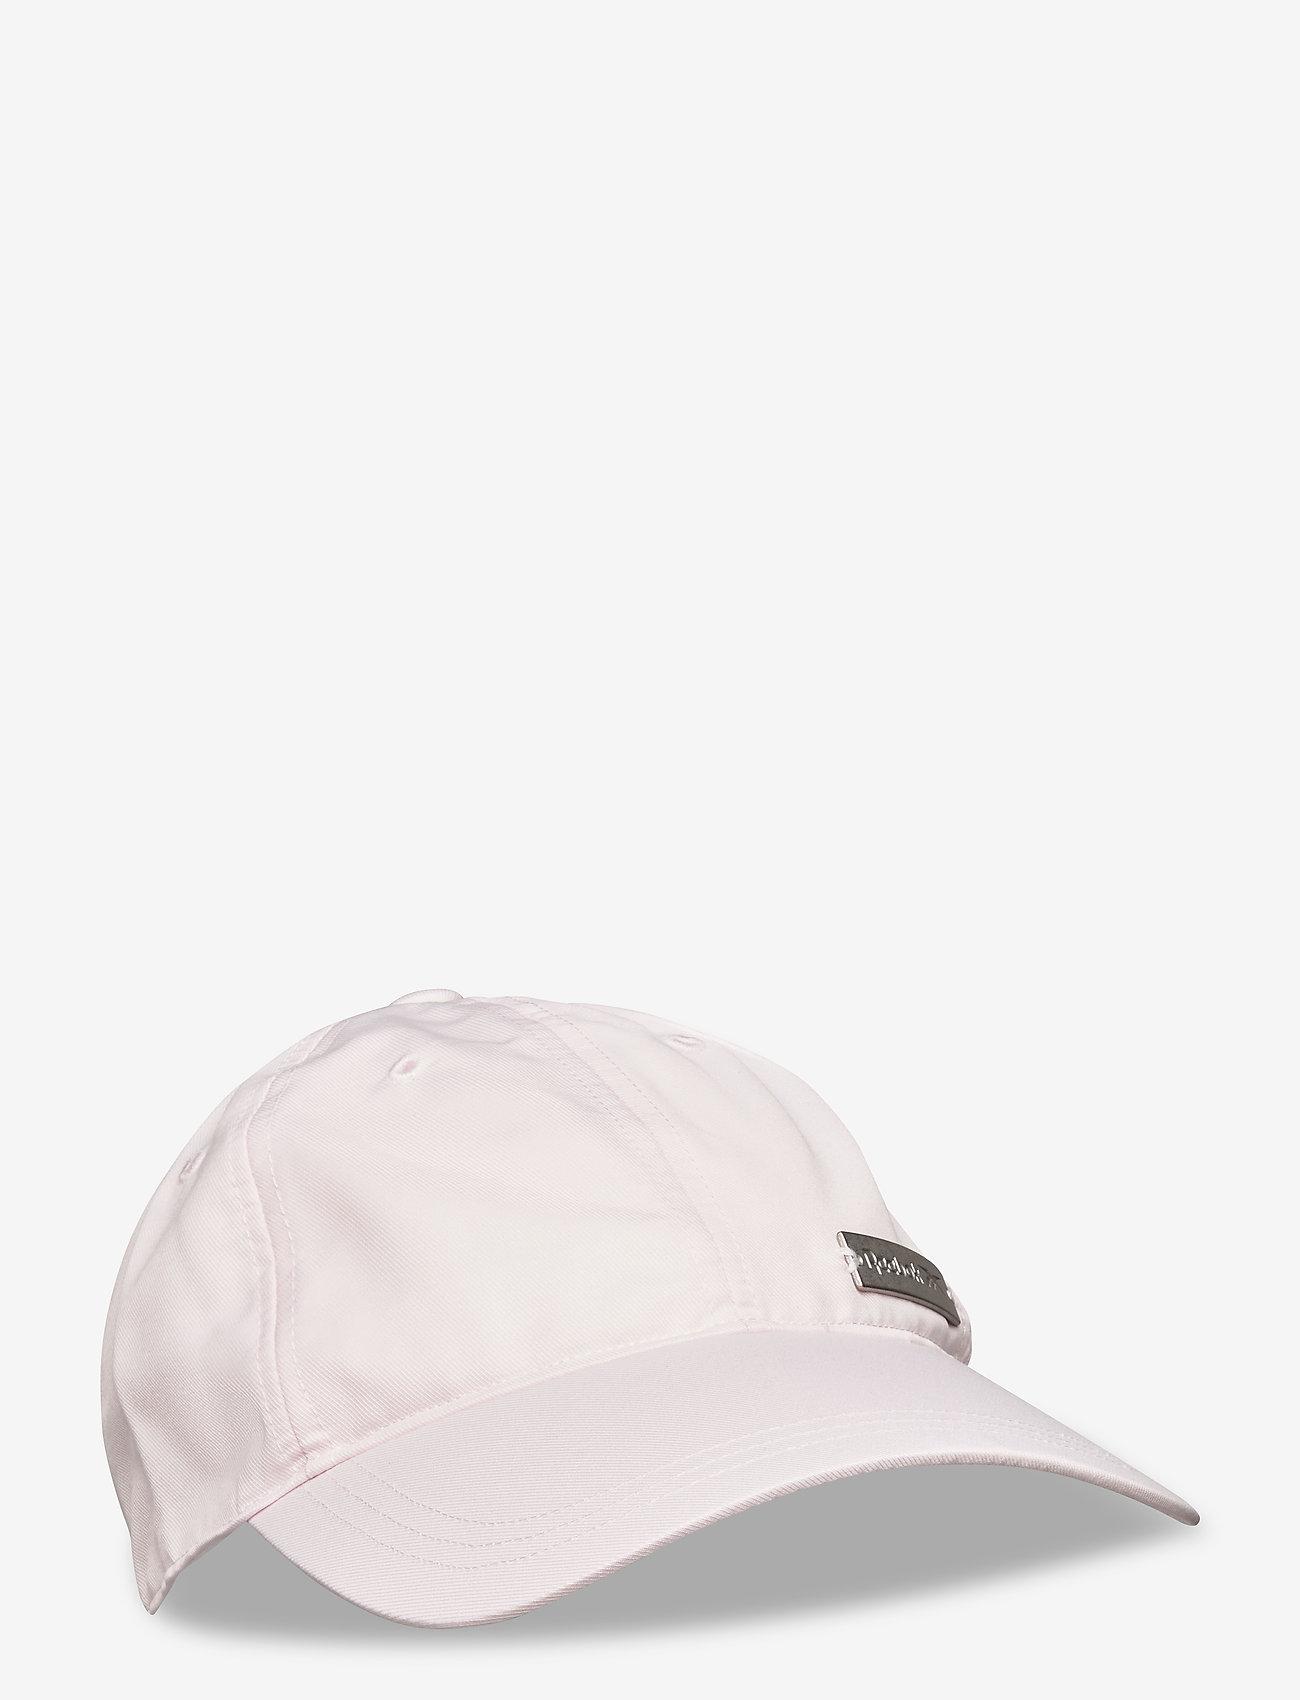 Reebok Performance - W FOUND CAP - kasketter - glapnk - 0